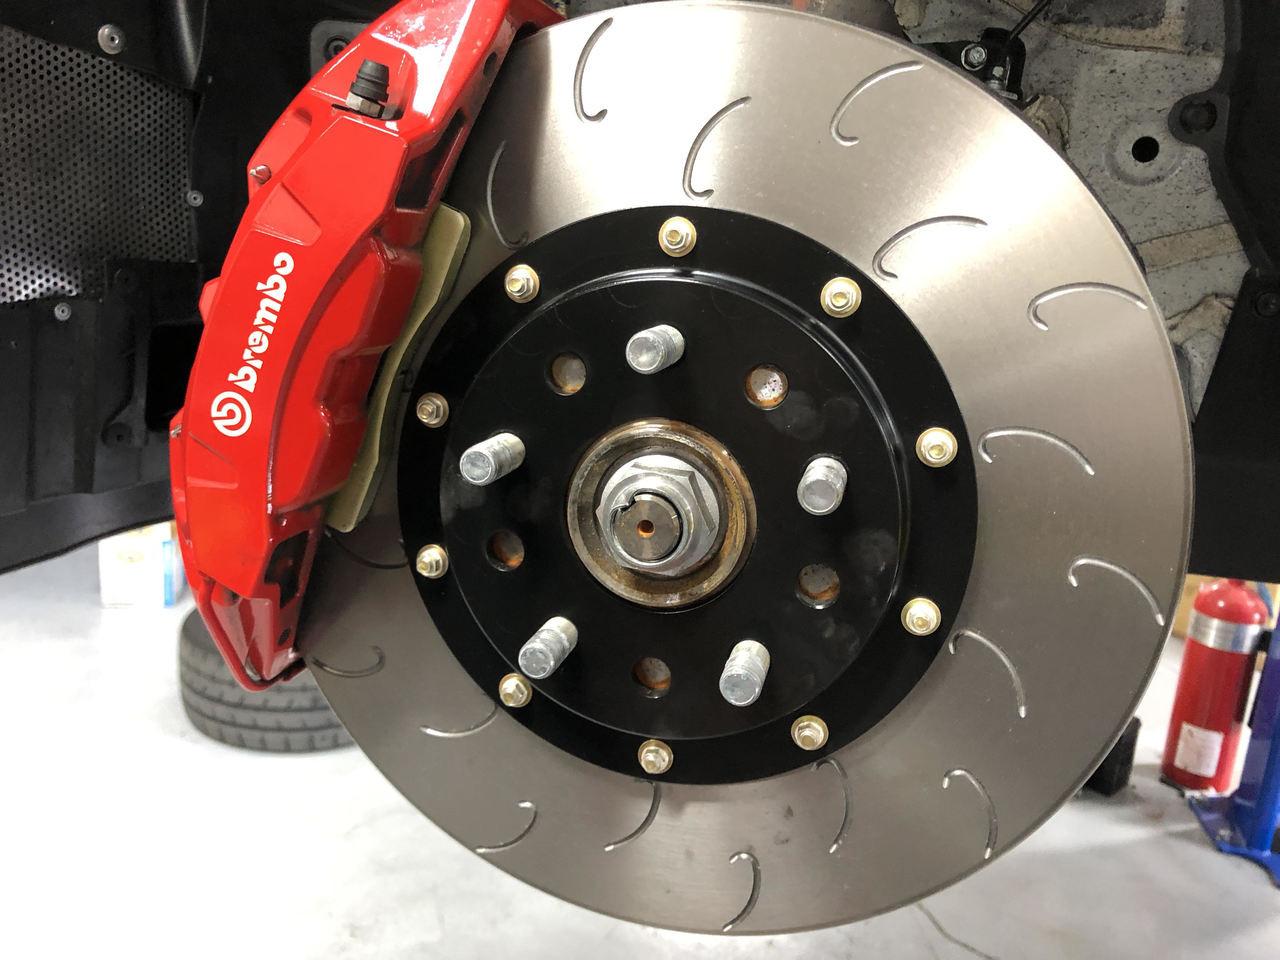 AutoShack RSMK64125-64125-1047-2-4 Front Brake Rotors and Semi Metallic Pads